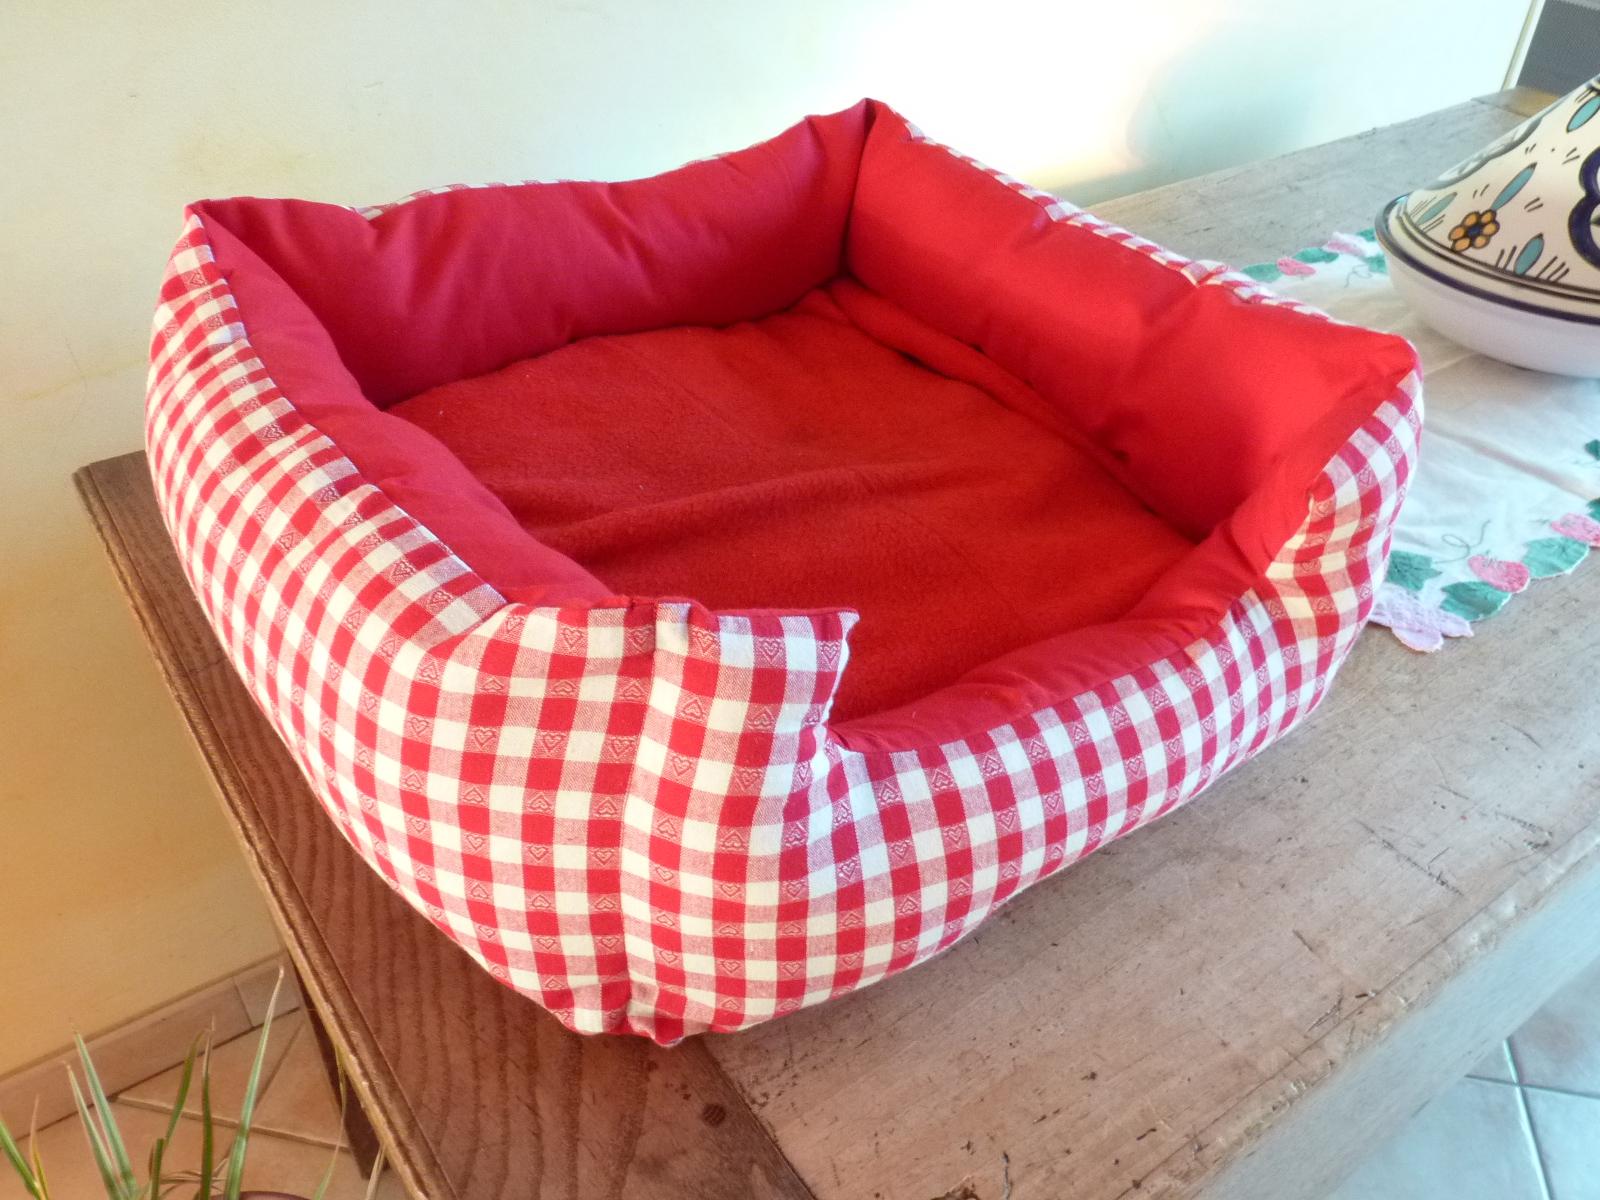 sophie mais 39 amours pani re chat. Black Bedroom Furniture Sets. Home Design Ideas